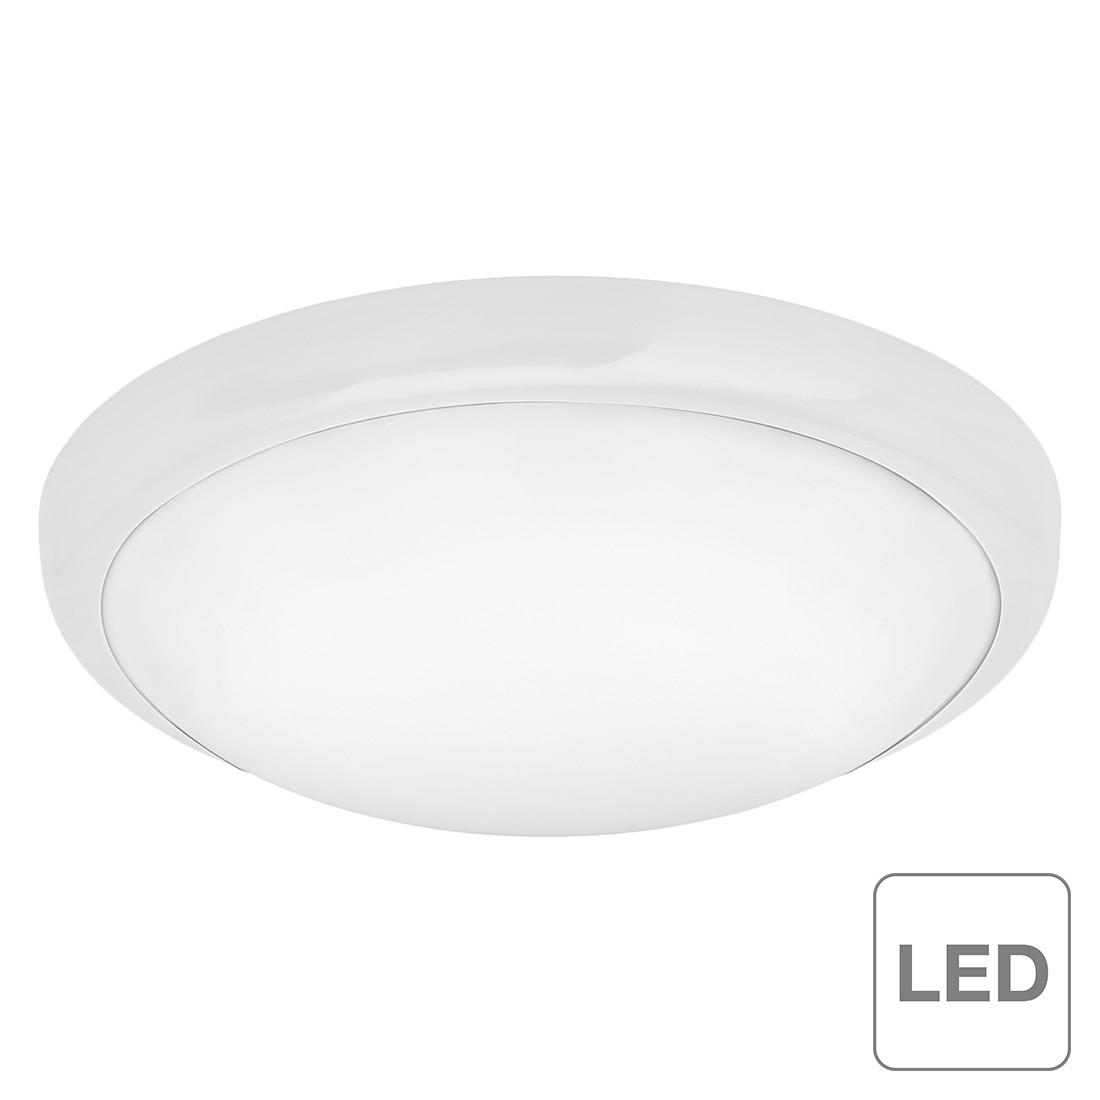 LED Wand-/Deckenleuchte Vigor